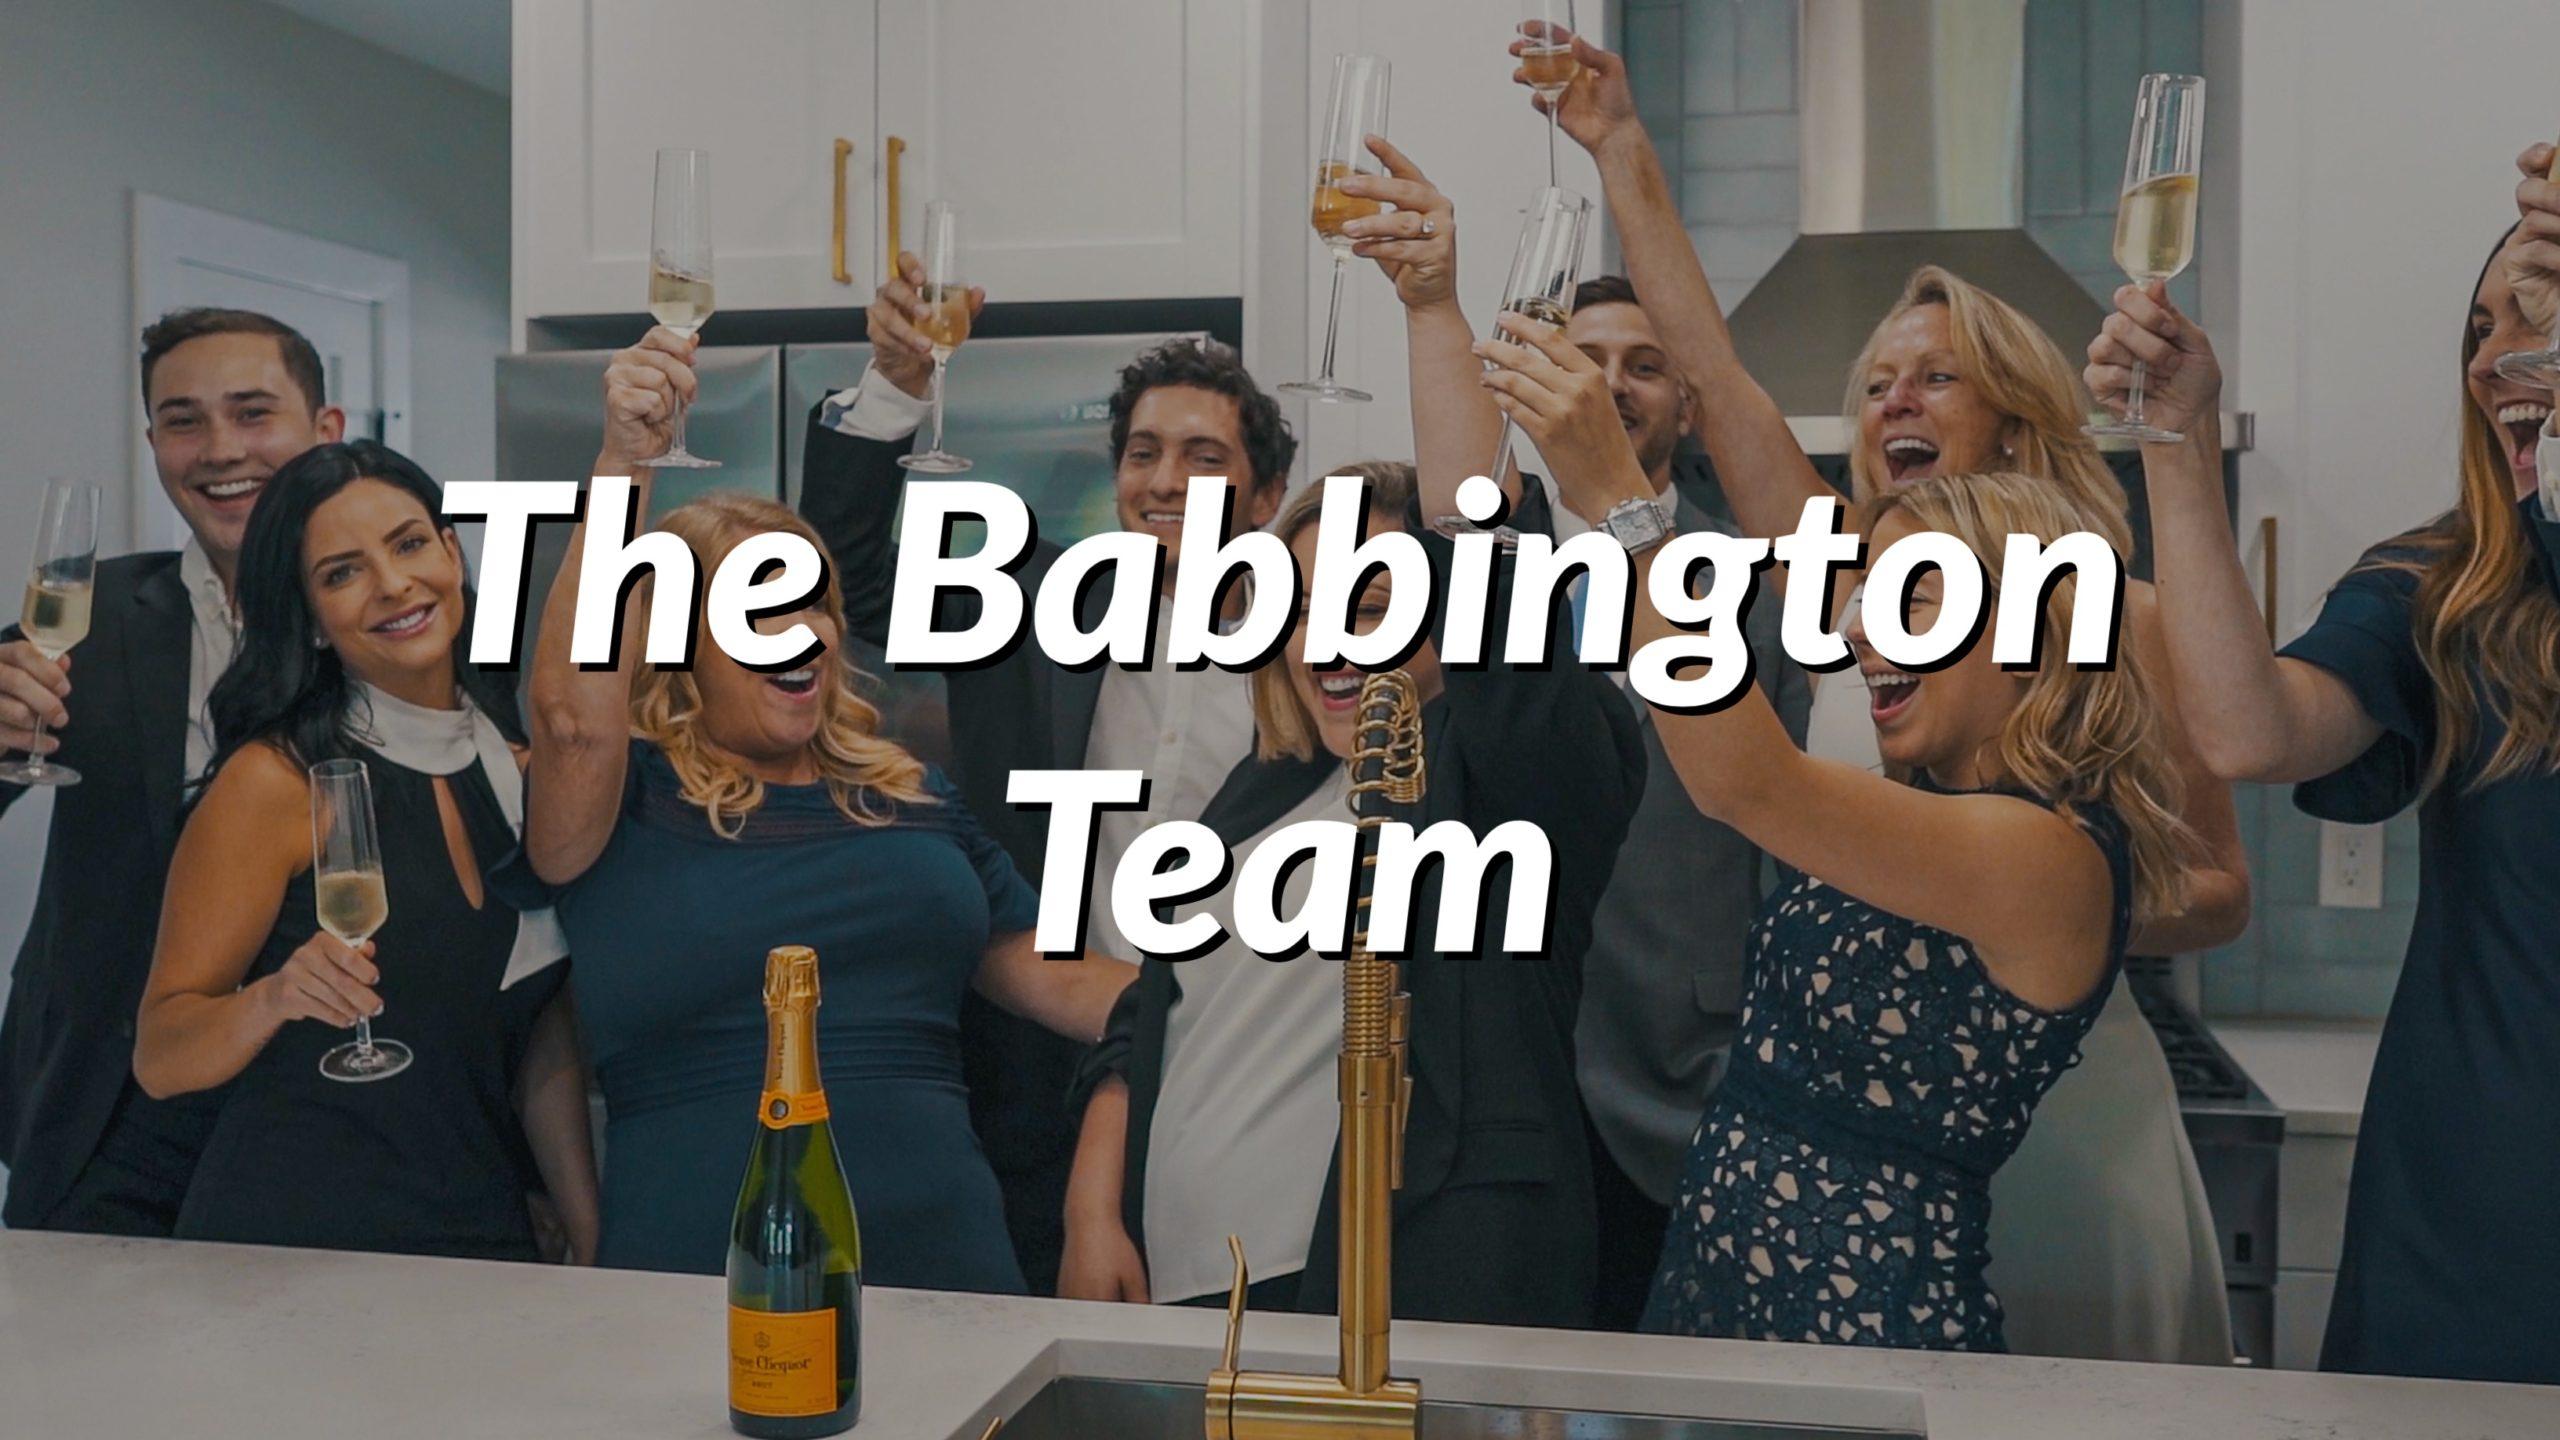 Babbington Team Custom